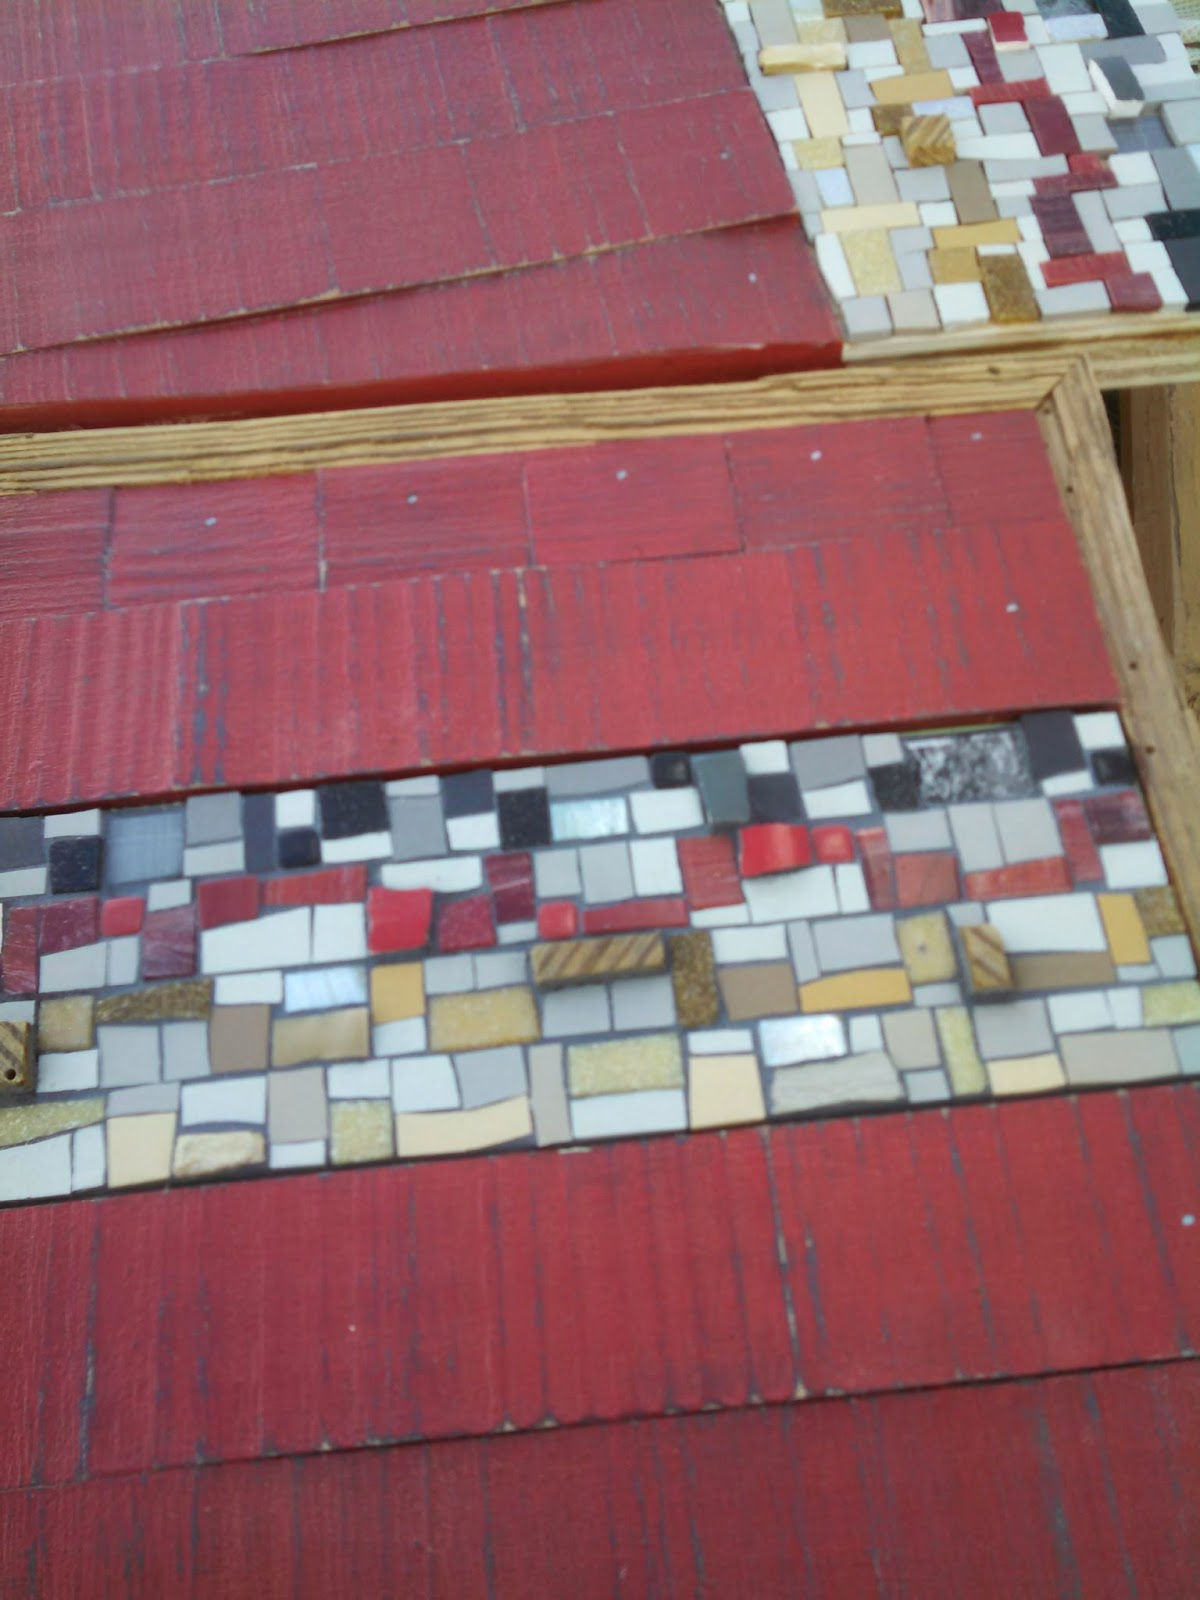 CBoy-fitting-the-mosaics.jpg